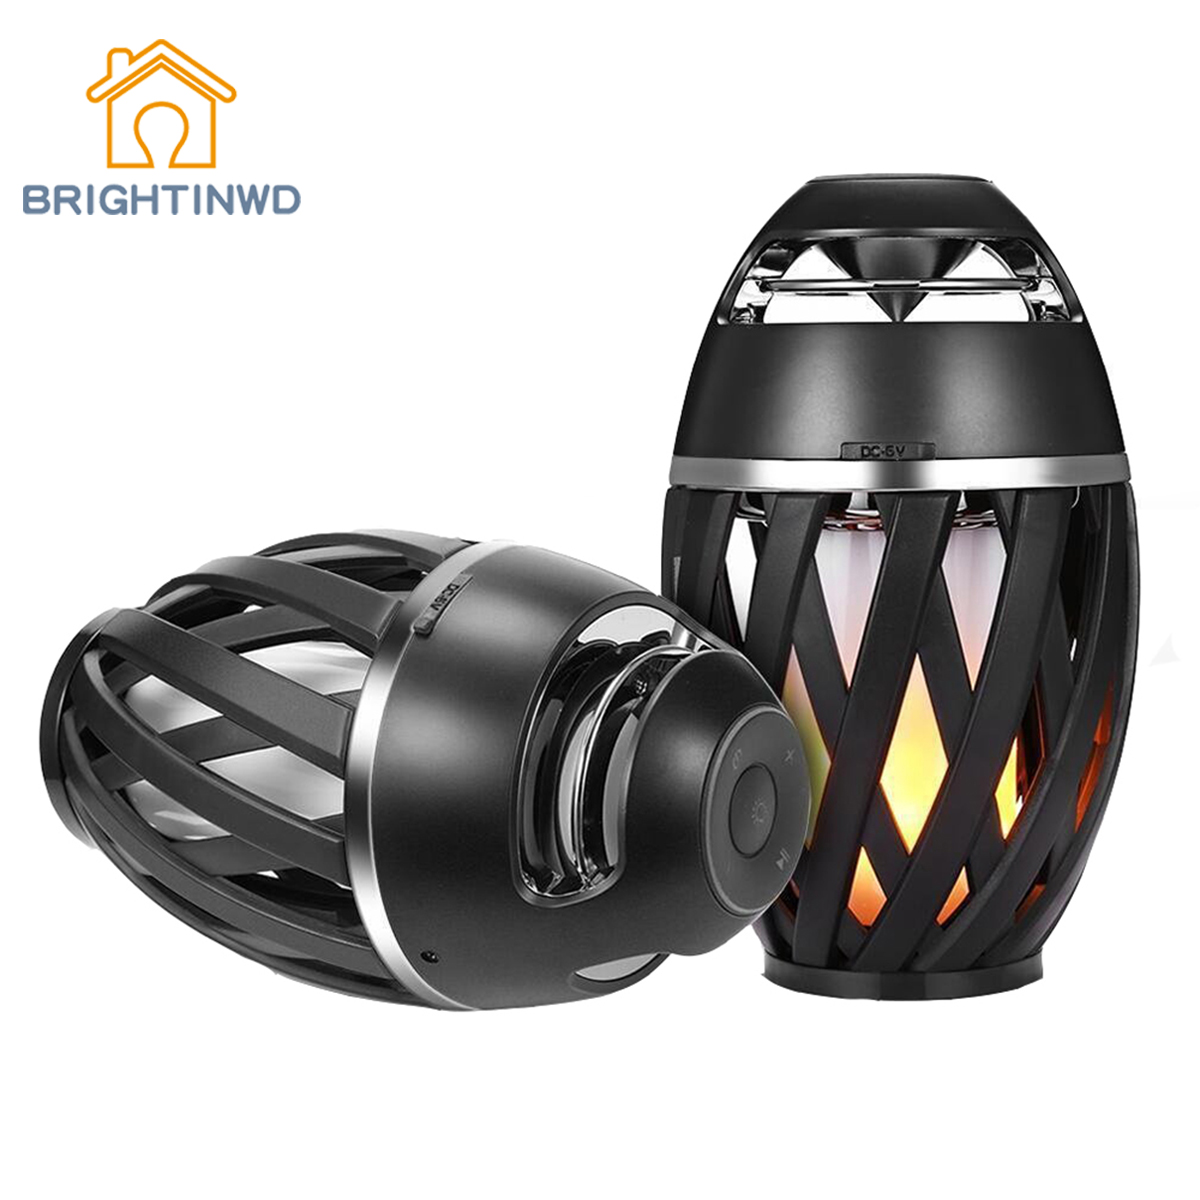 BRIGHTINWD i3 Flame Light Wireless Waterproof Flame Bluetooth Speaker Creative Mini Ambience Light Lawn Light